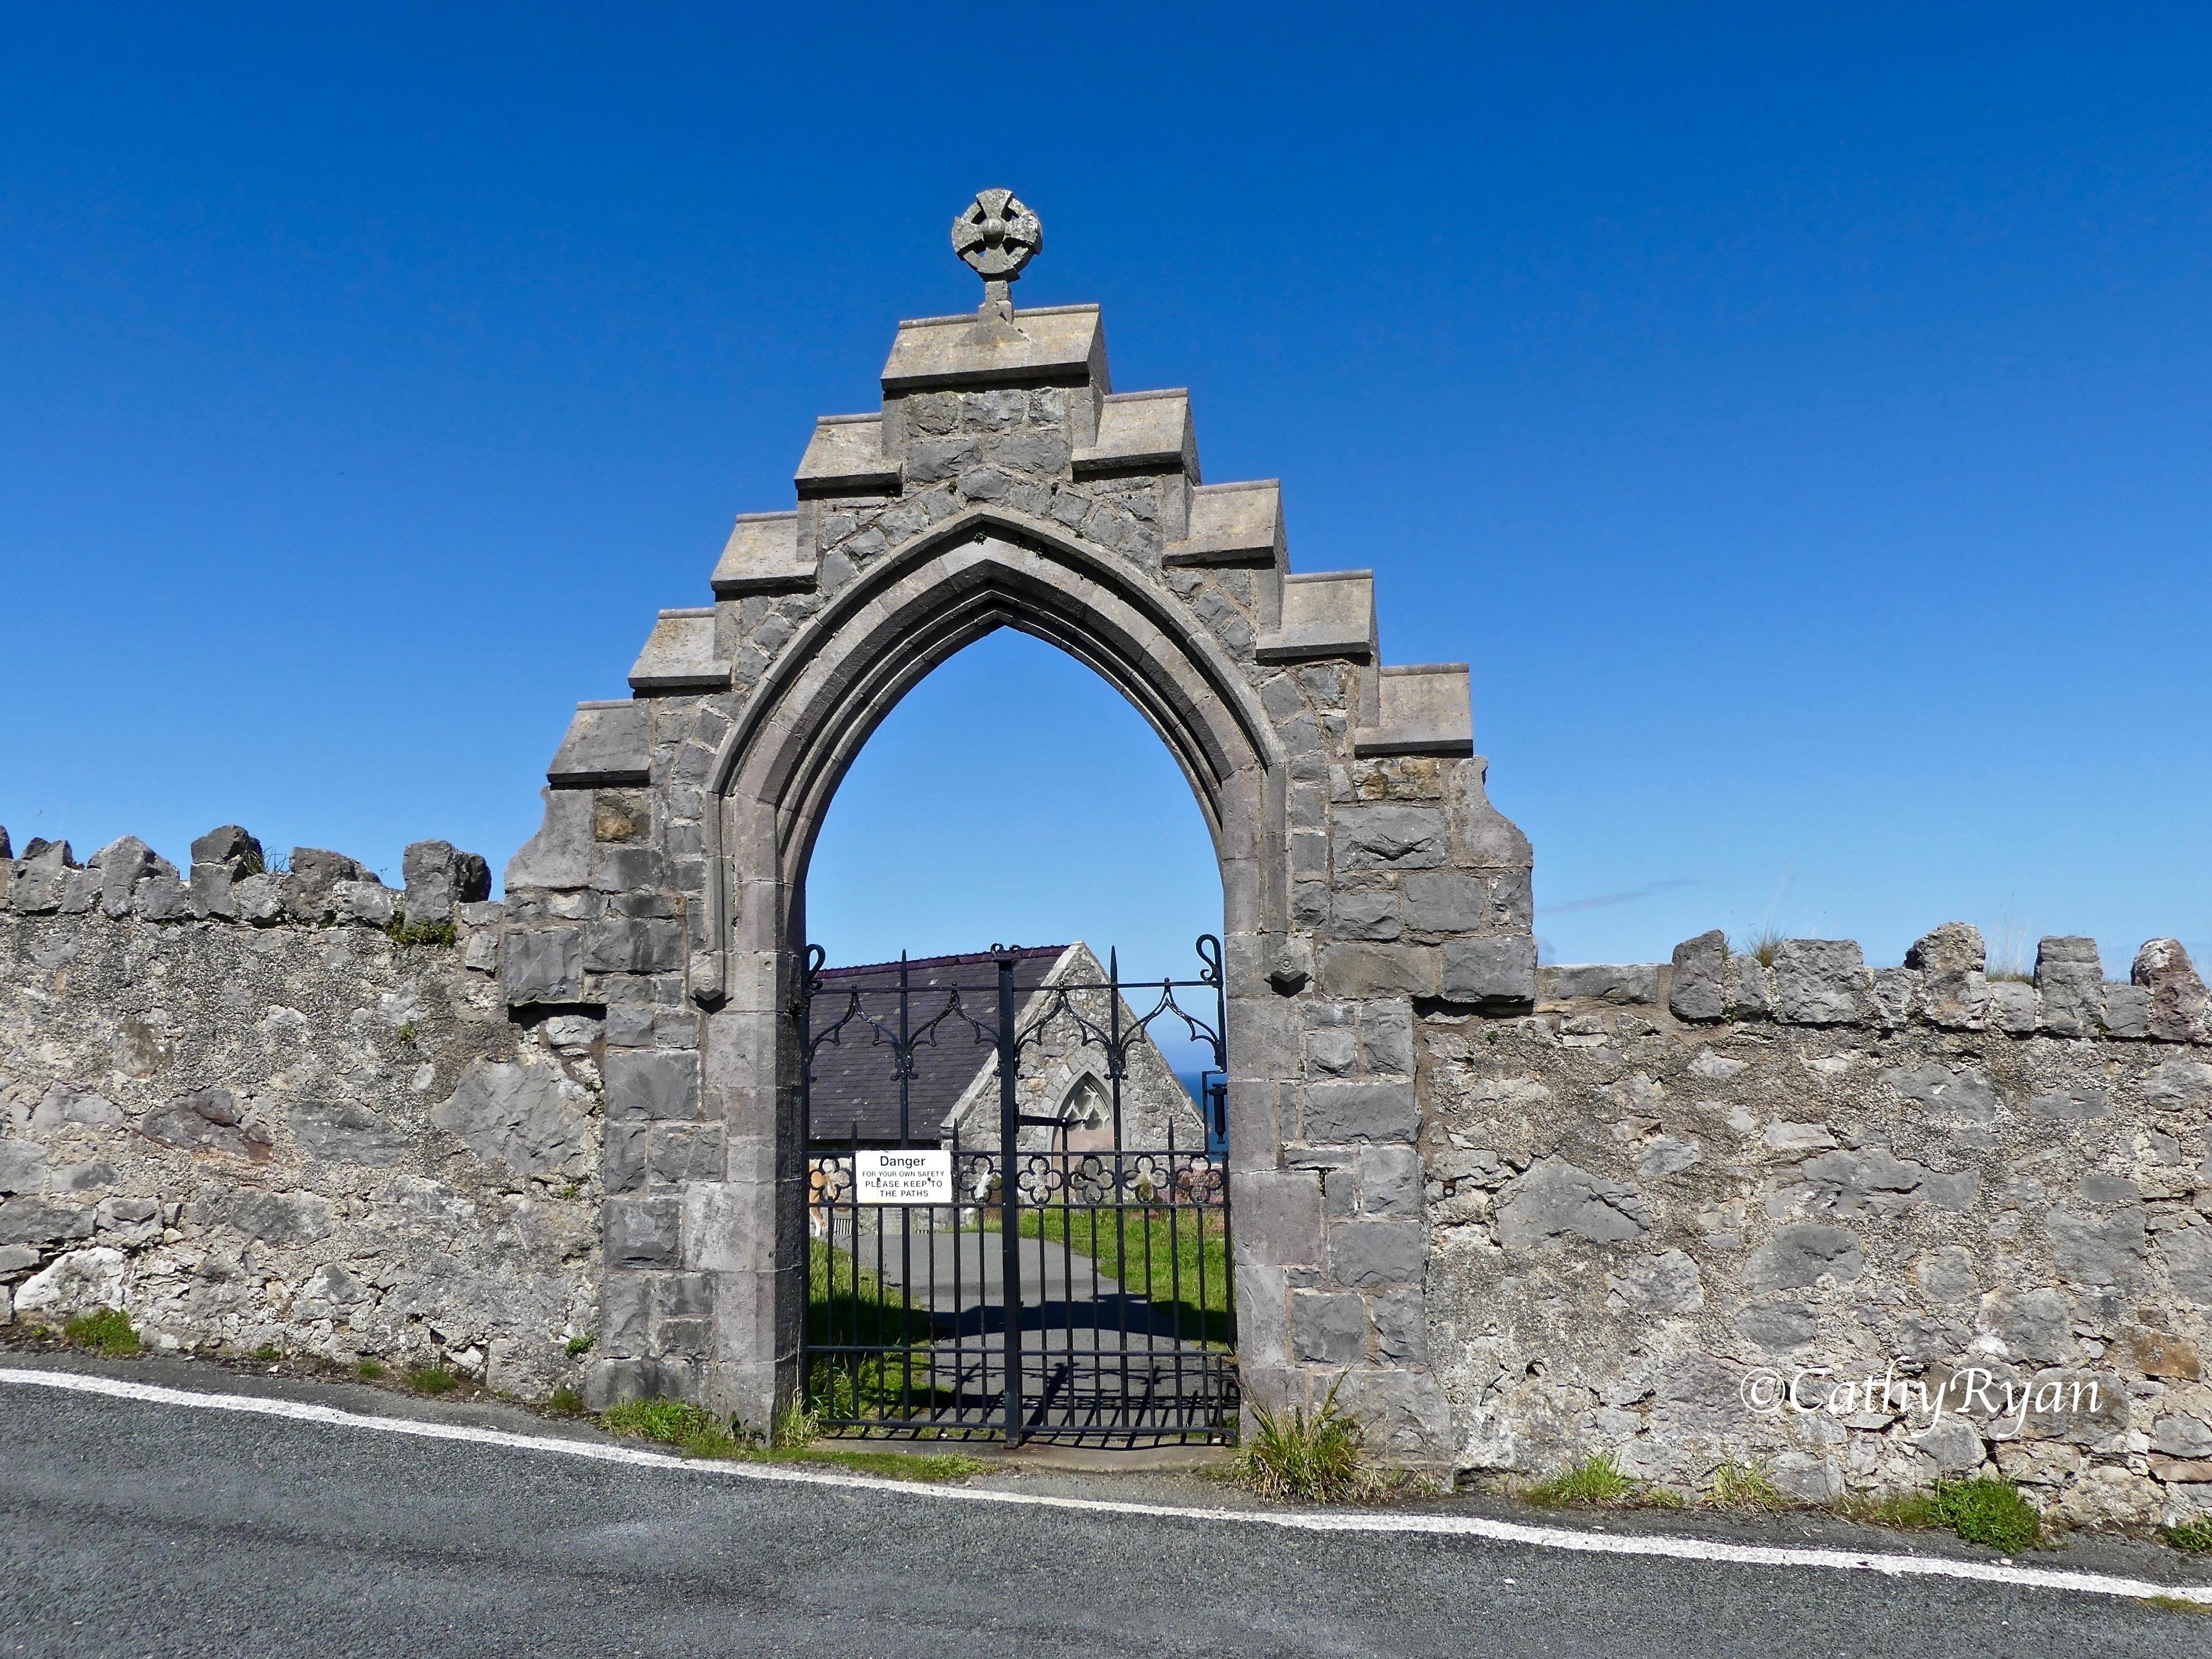 St Tudno's #Church #Photography #SundayBlogShare ~ Exploring the Great Orme